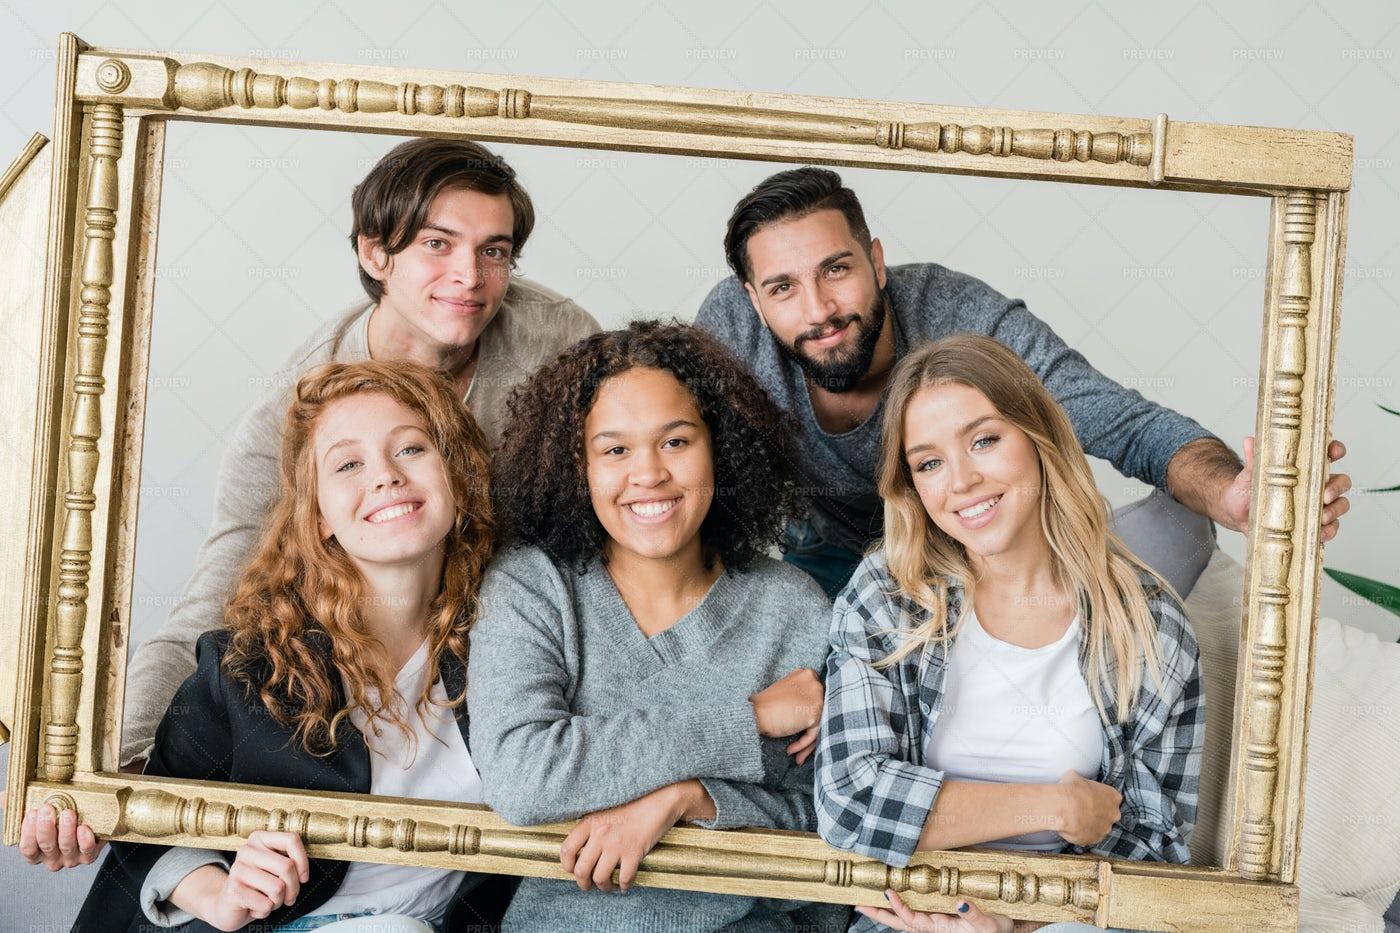 Group Of Young Intercultural...: Stock Photos